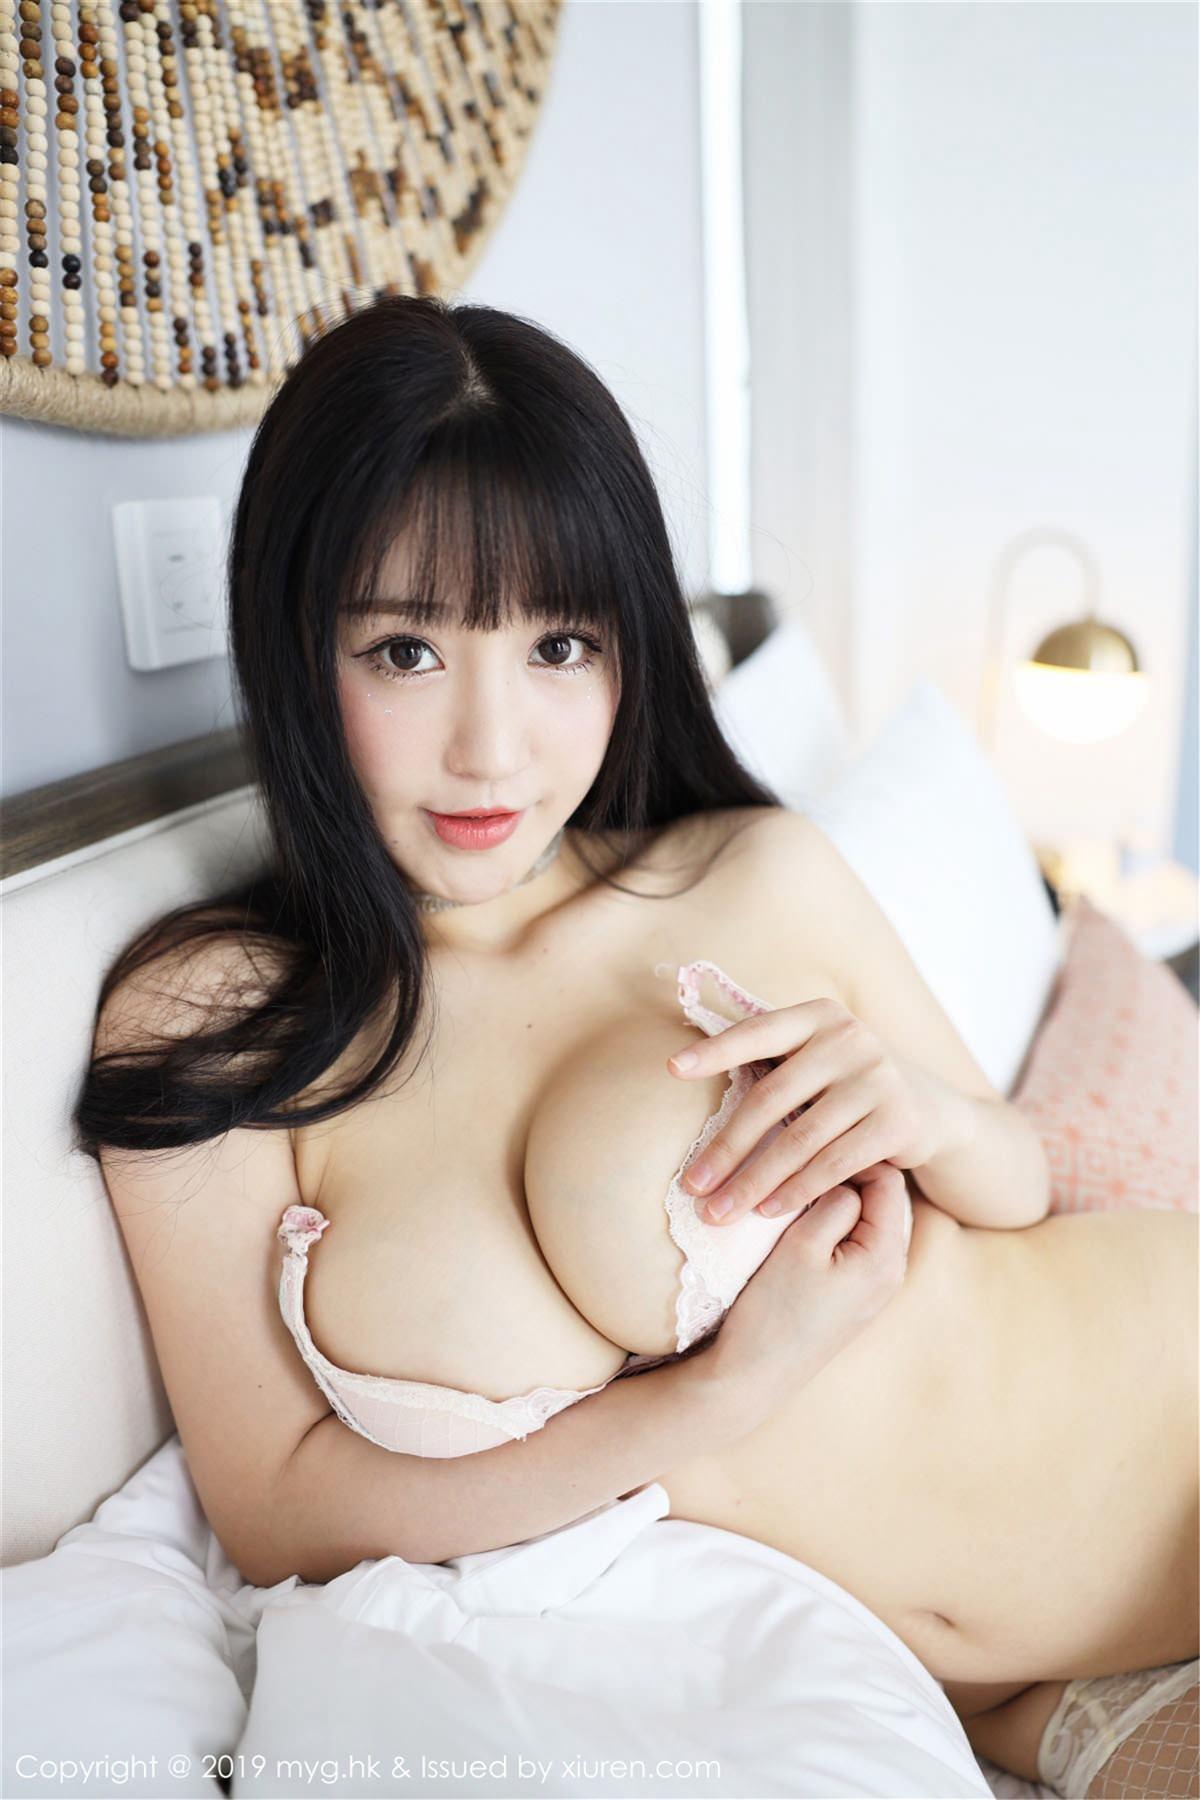 MyGirl Vol.364 41P, mygirl, Zhu Ke Er